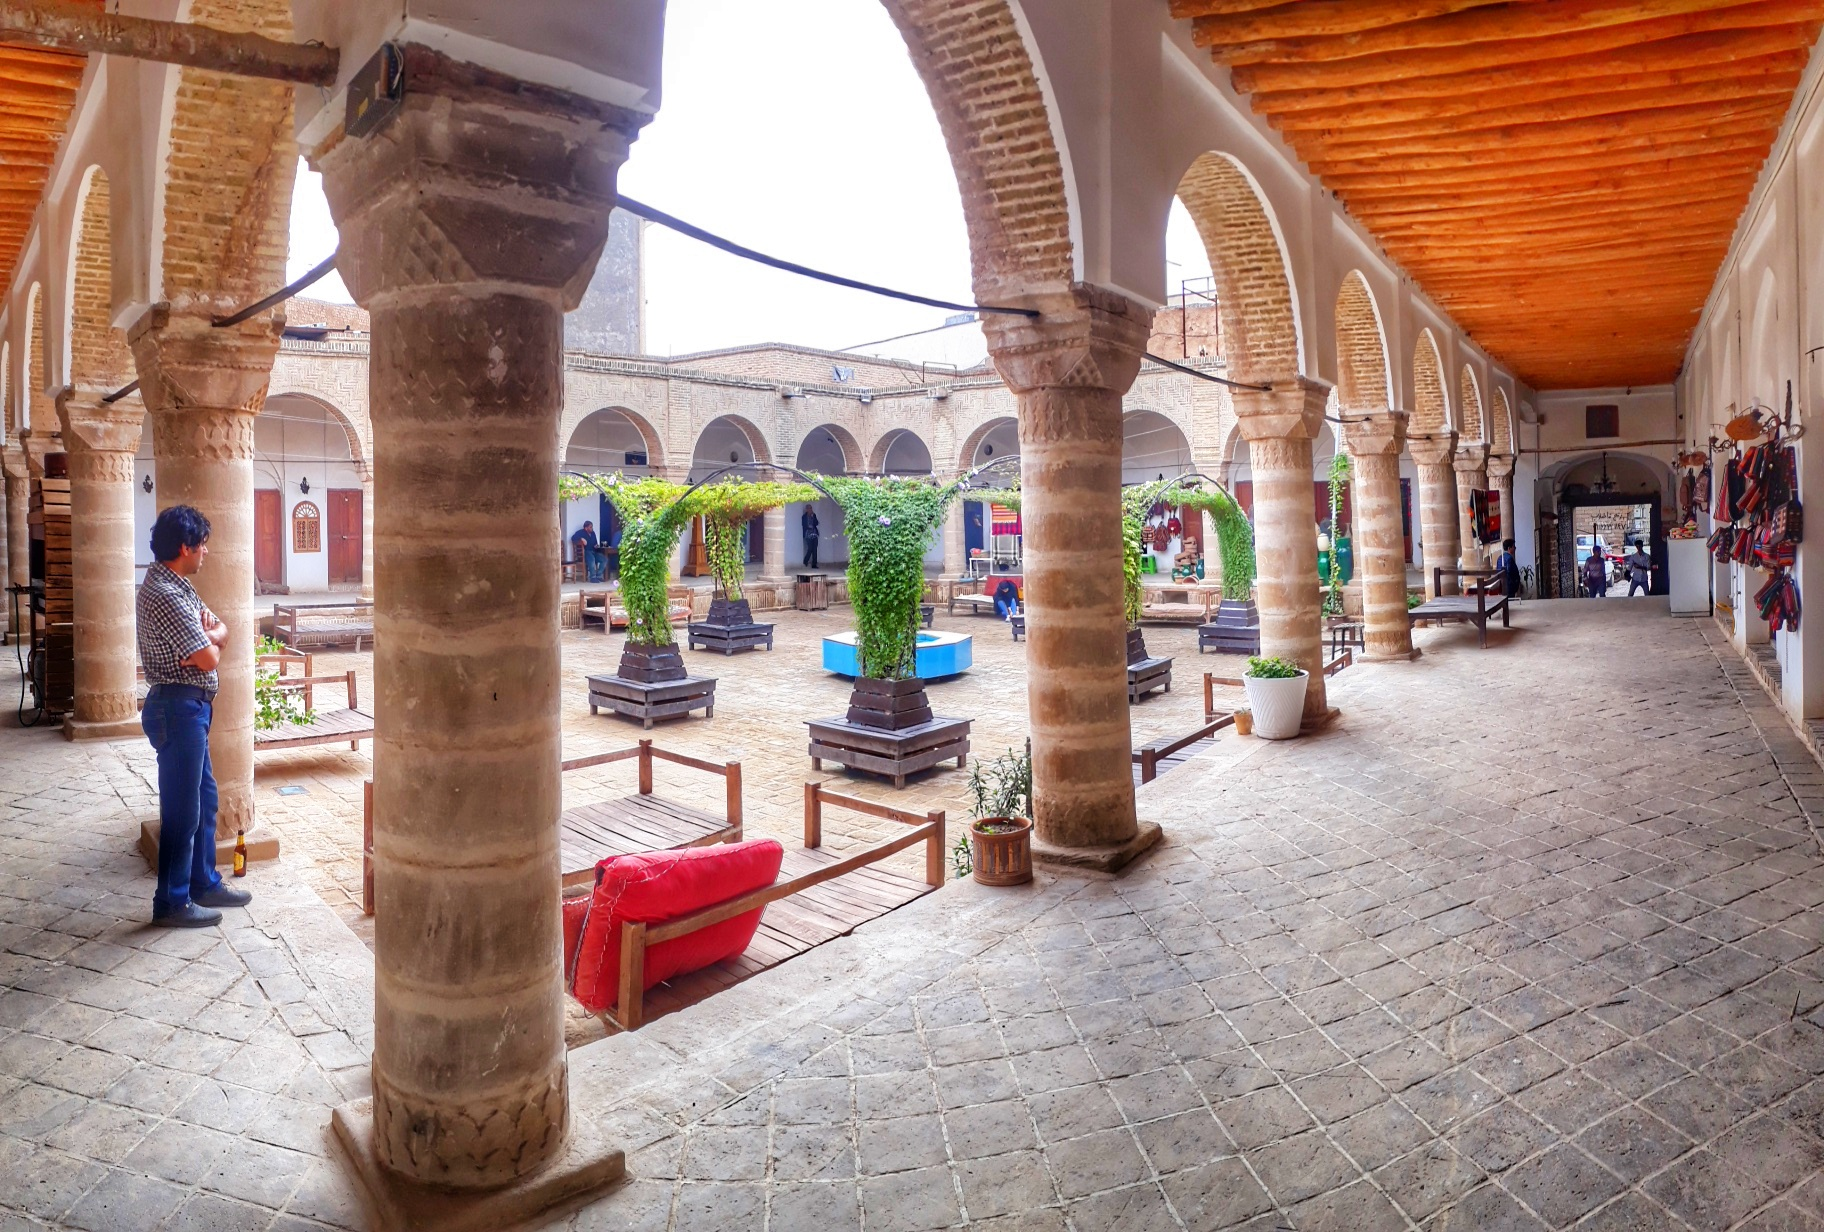 باسلام | Basalam - شوشتر خانه مستوفی